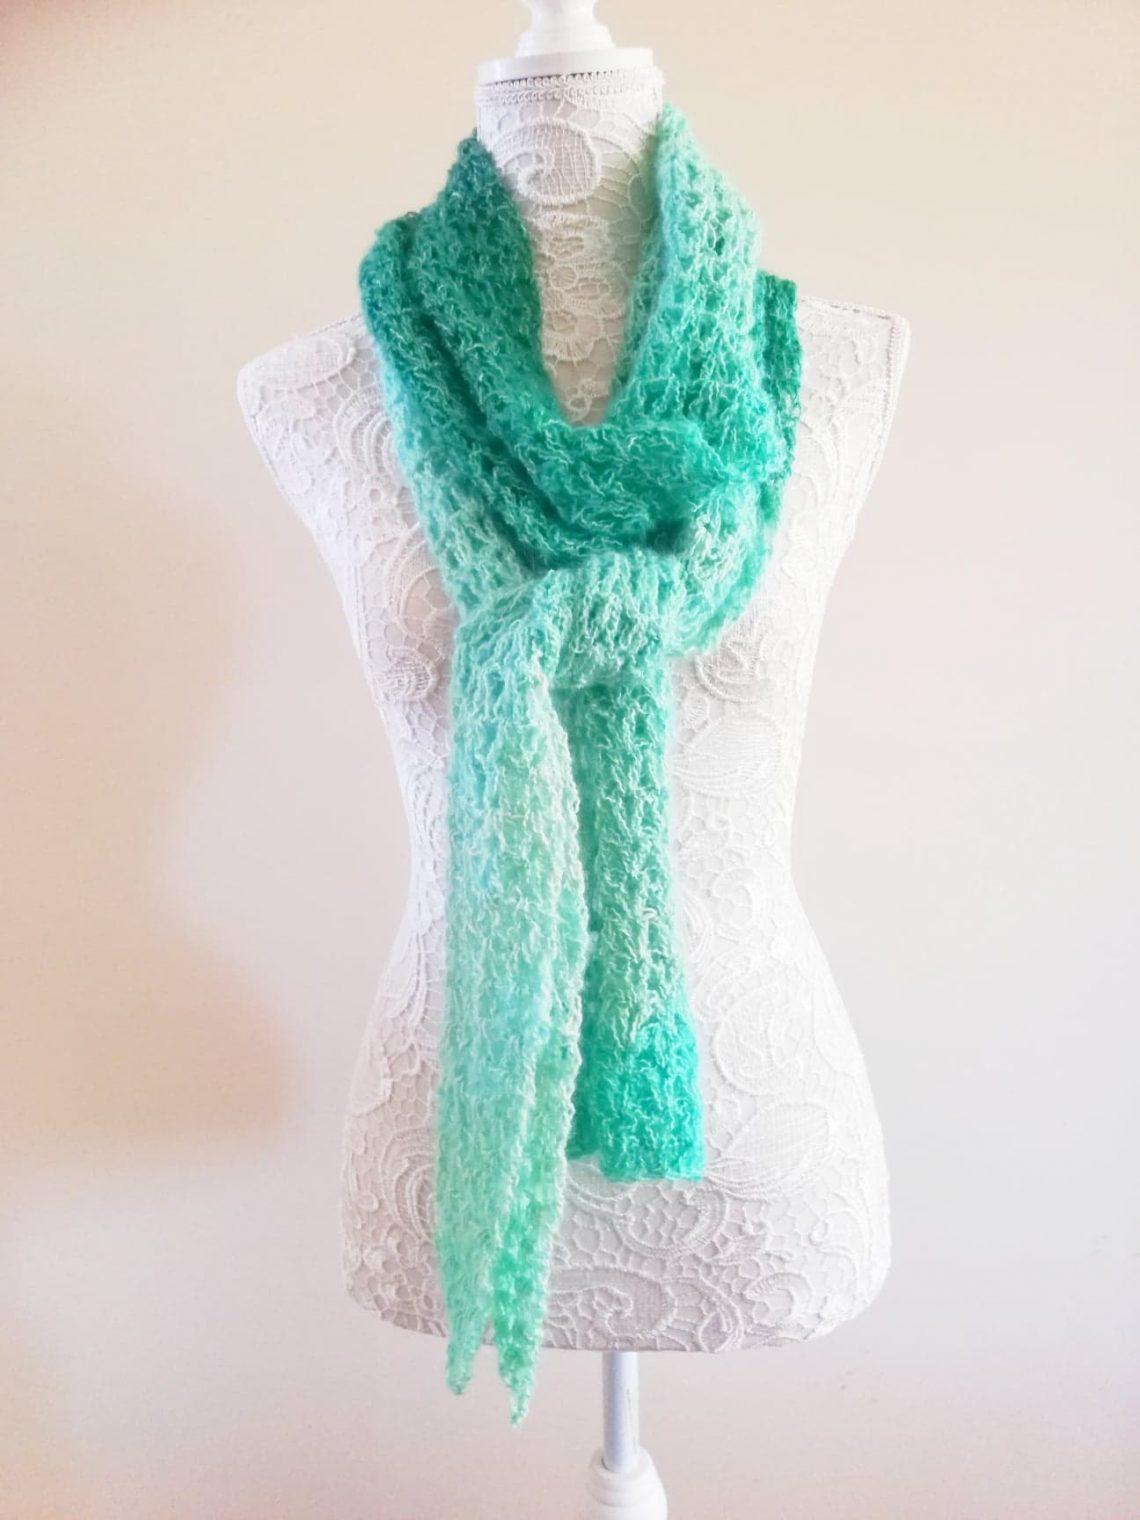 Crochet The Jade Pool Scarf